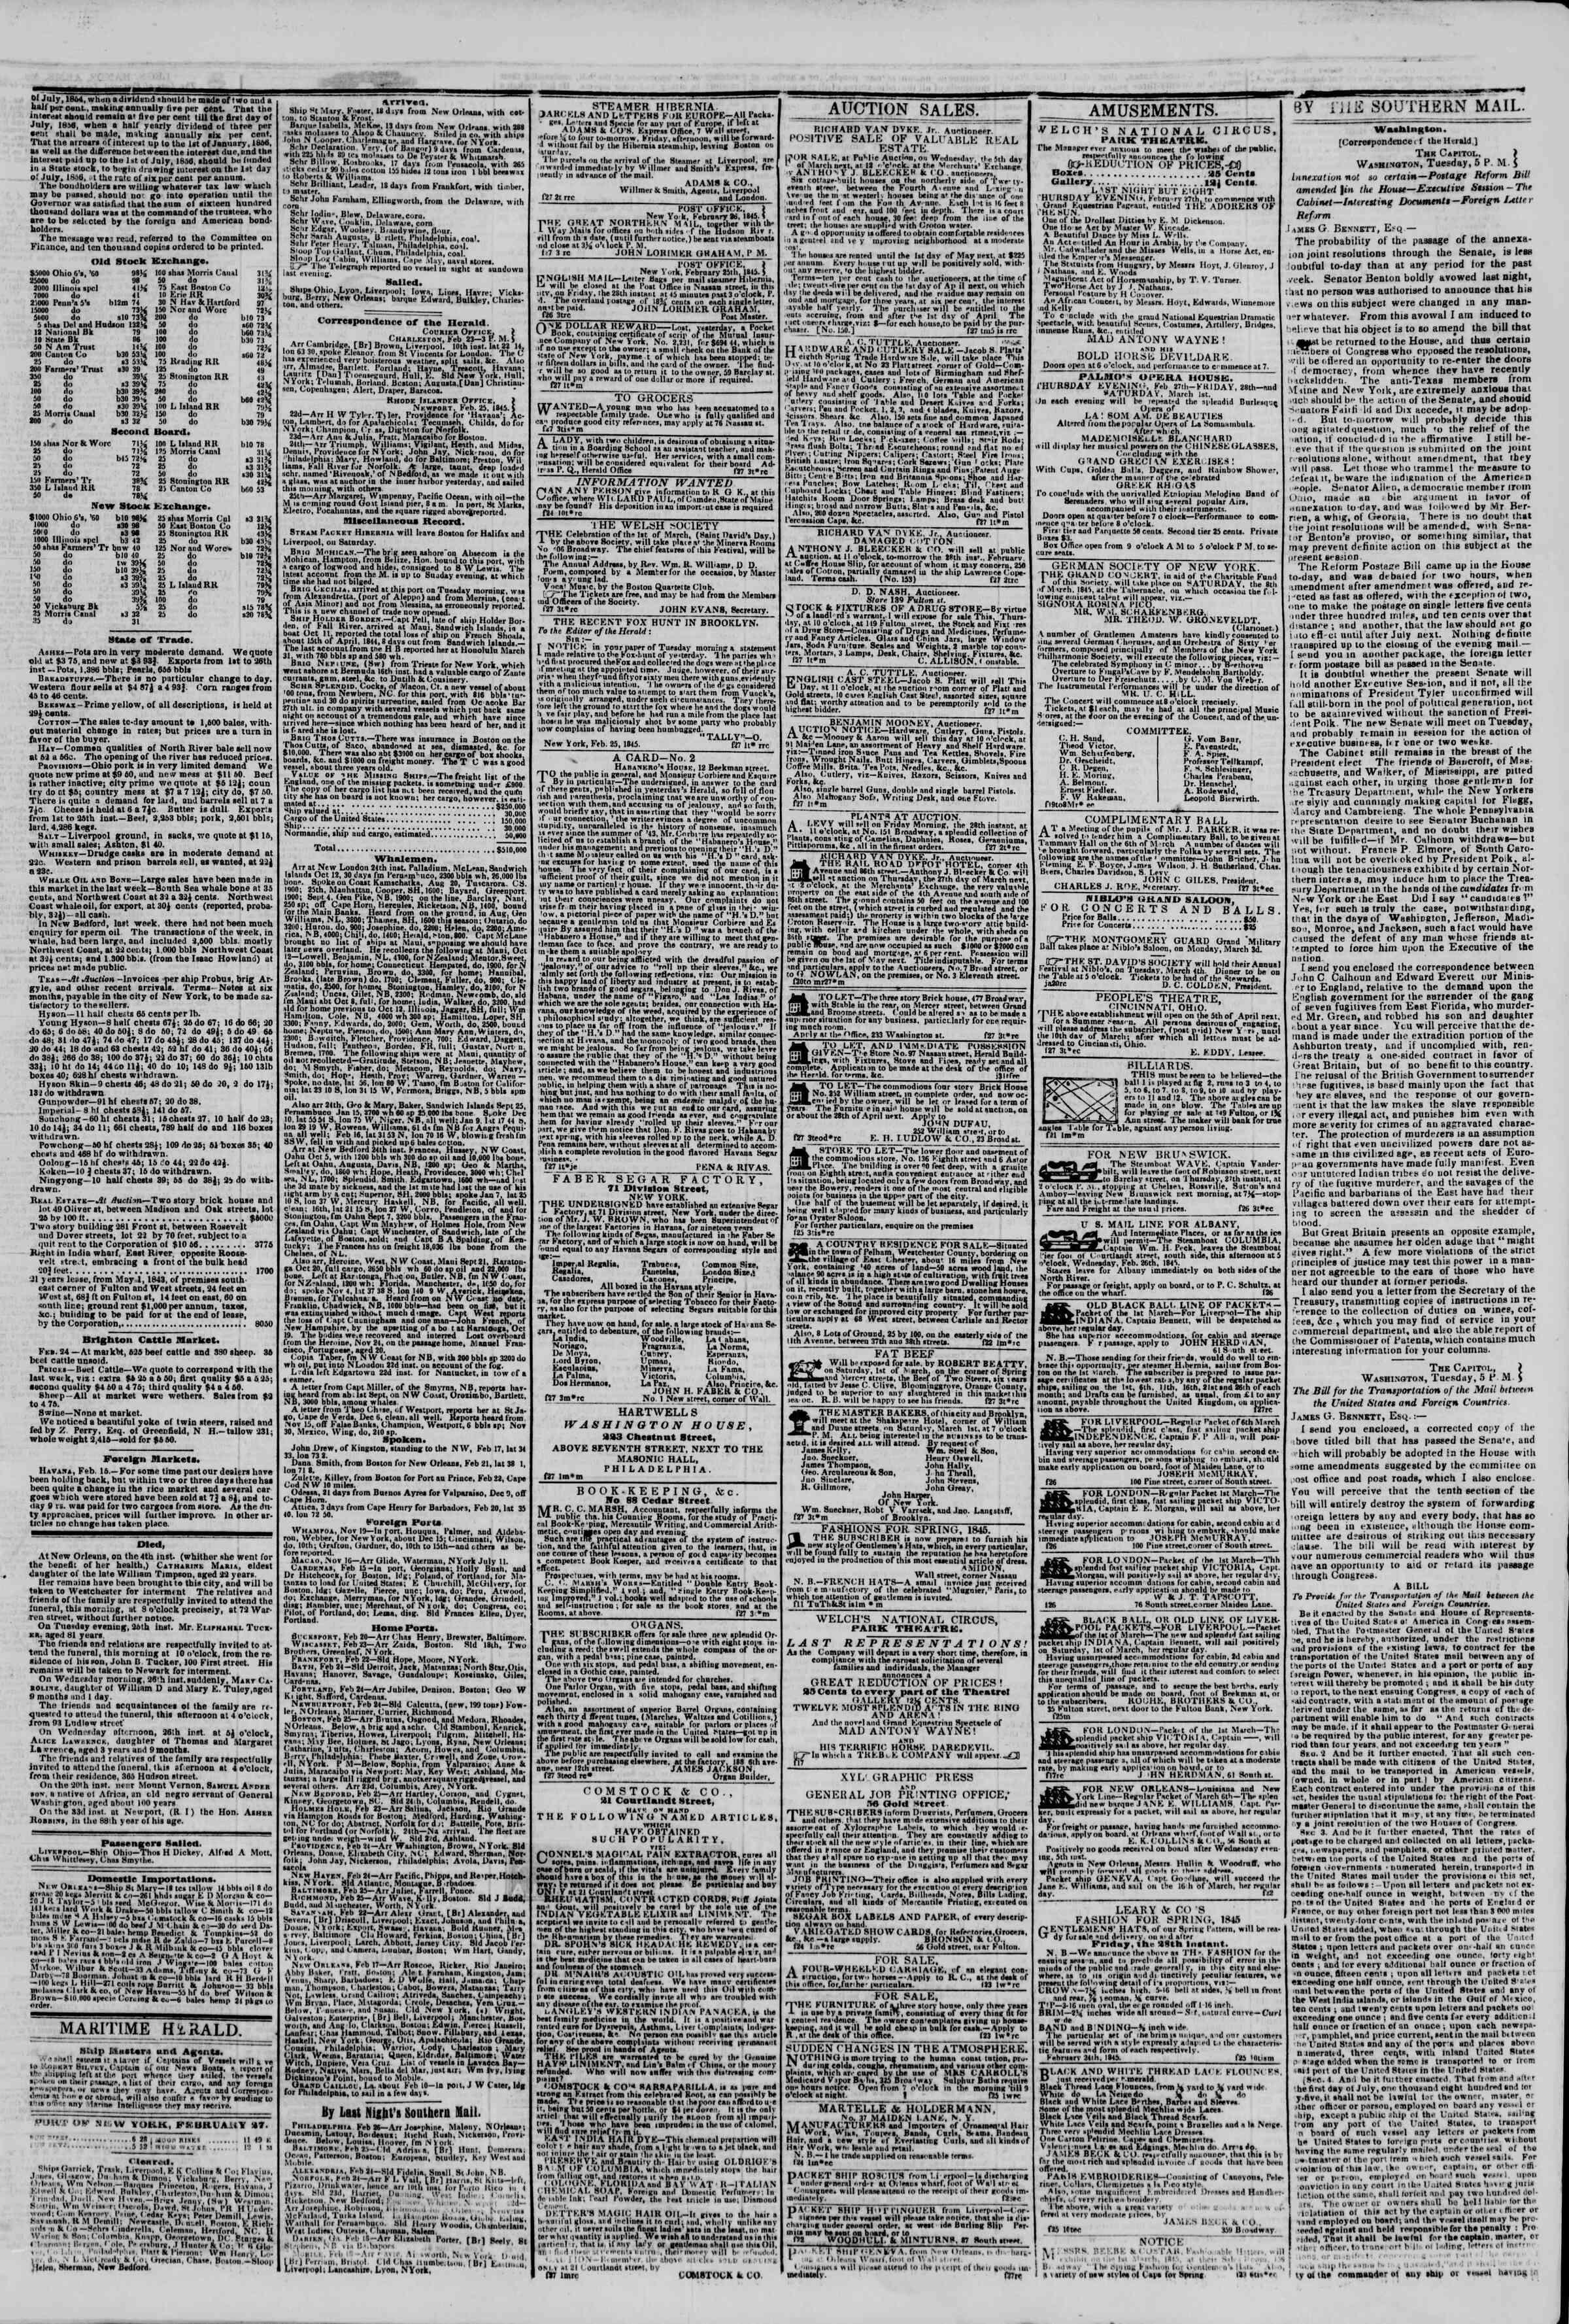 February 27, 1845 Tarihli The New York Herald Gazetesi Sayfa 3